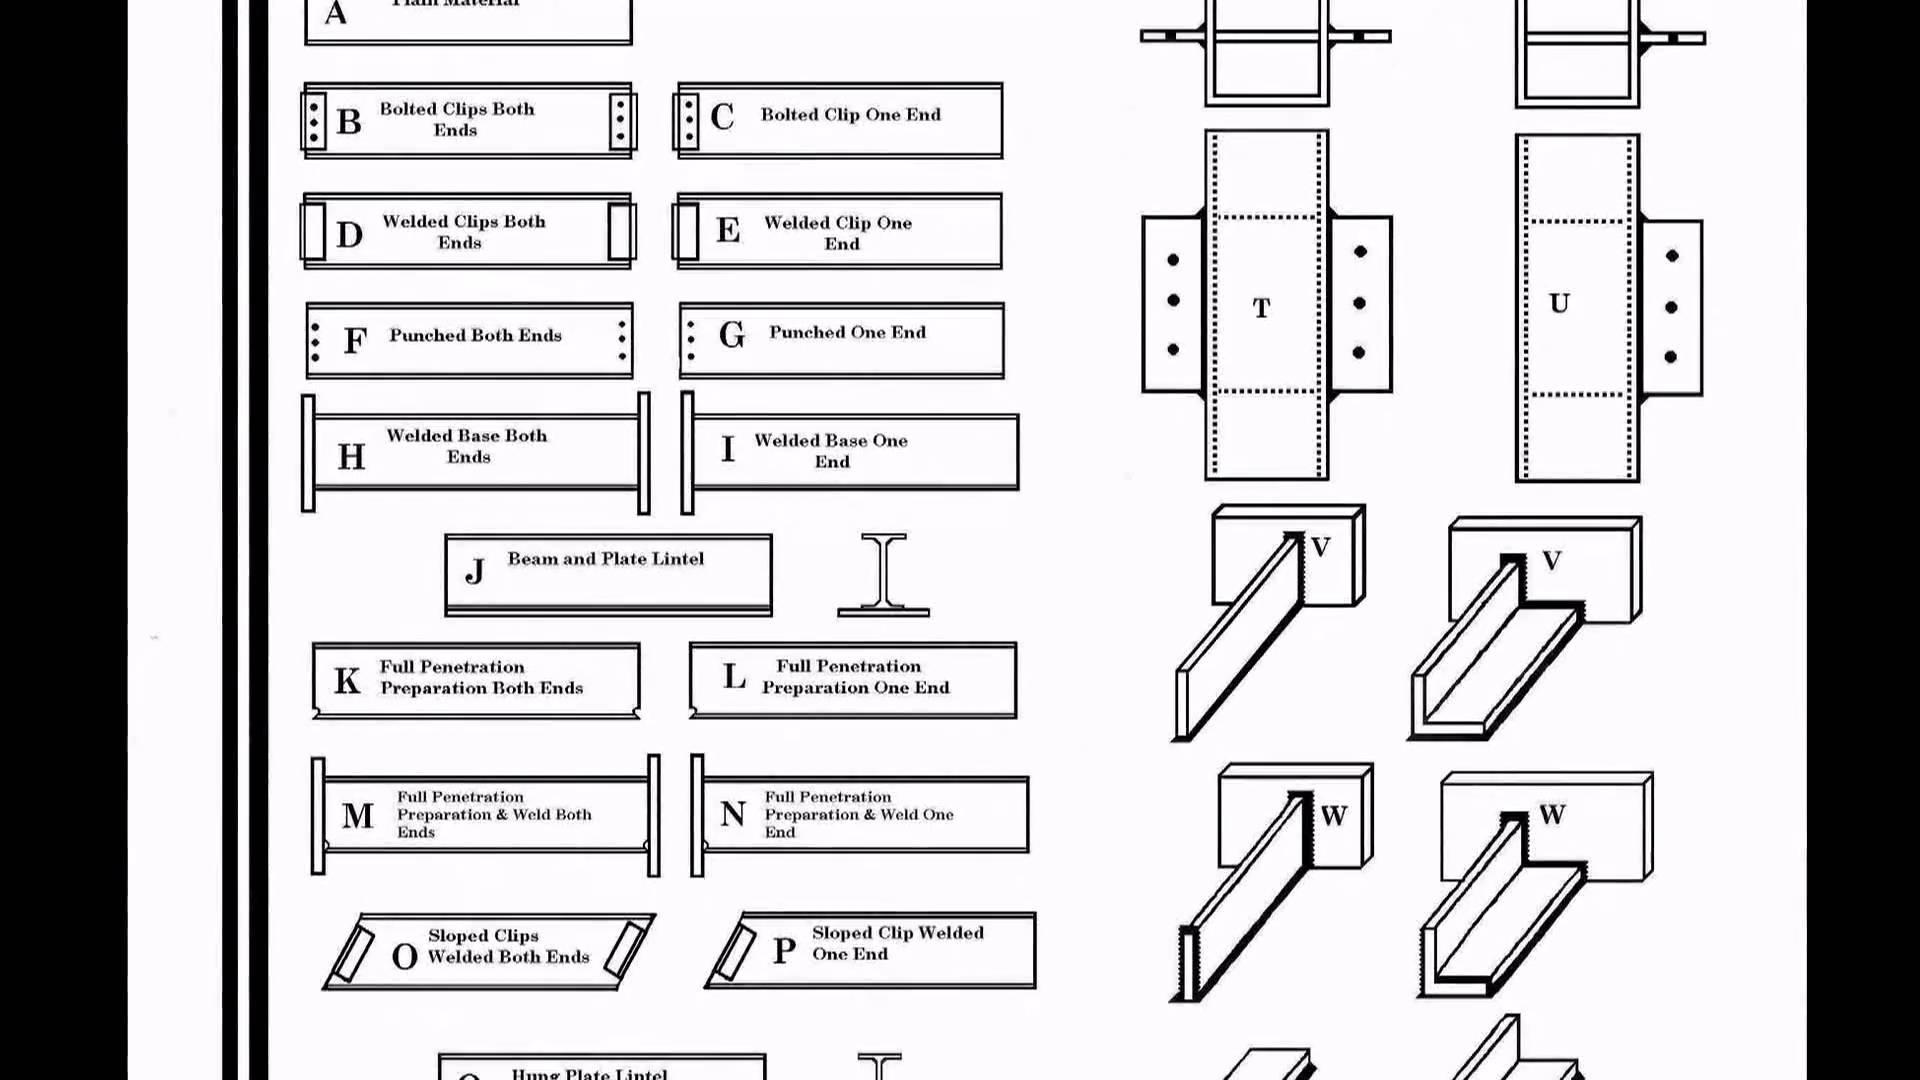 Steel Takeoff Spreadsheet Free Templates | Homebiz4U2Profit With Steel Takeoff Spreadsheet